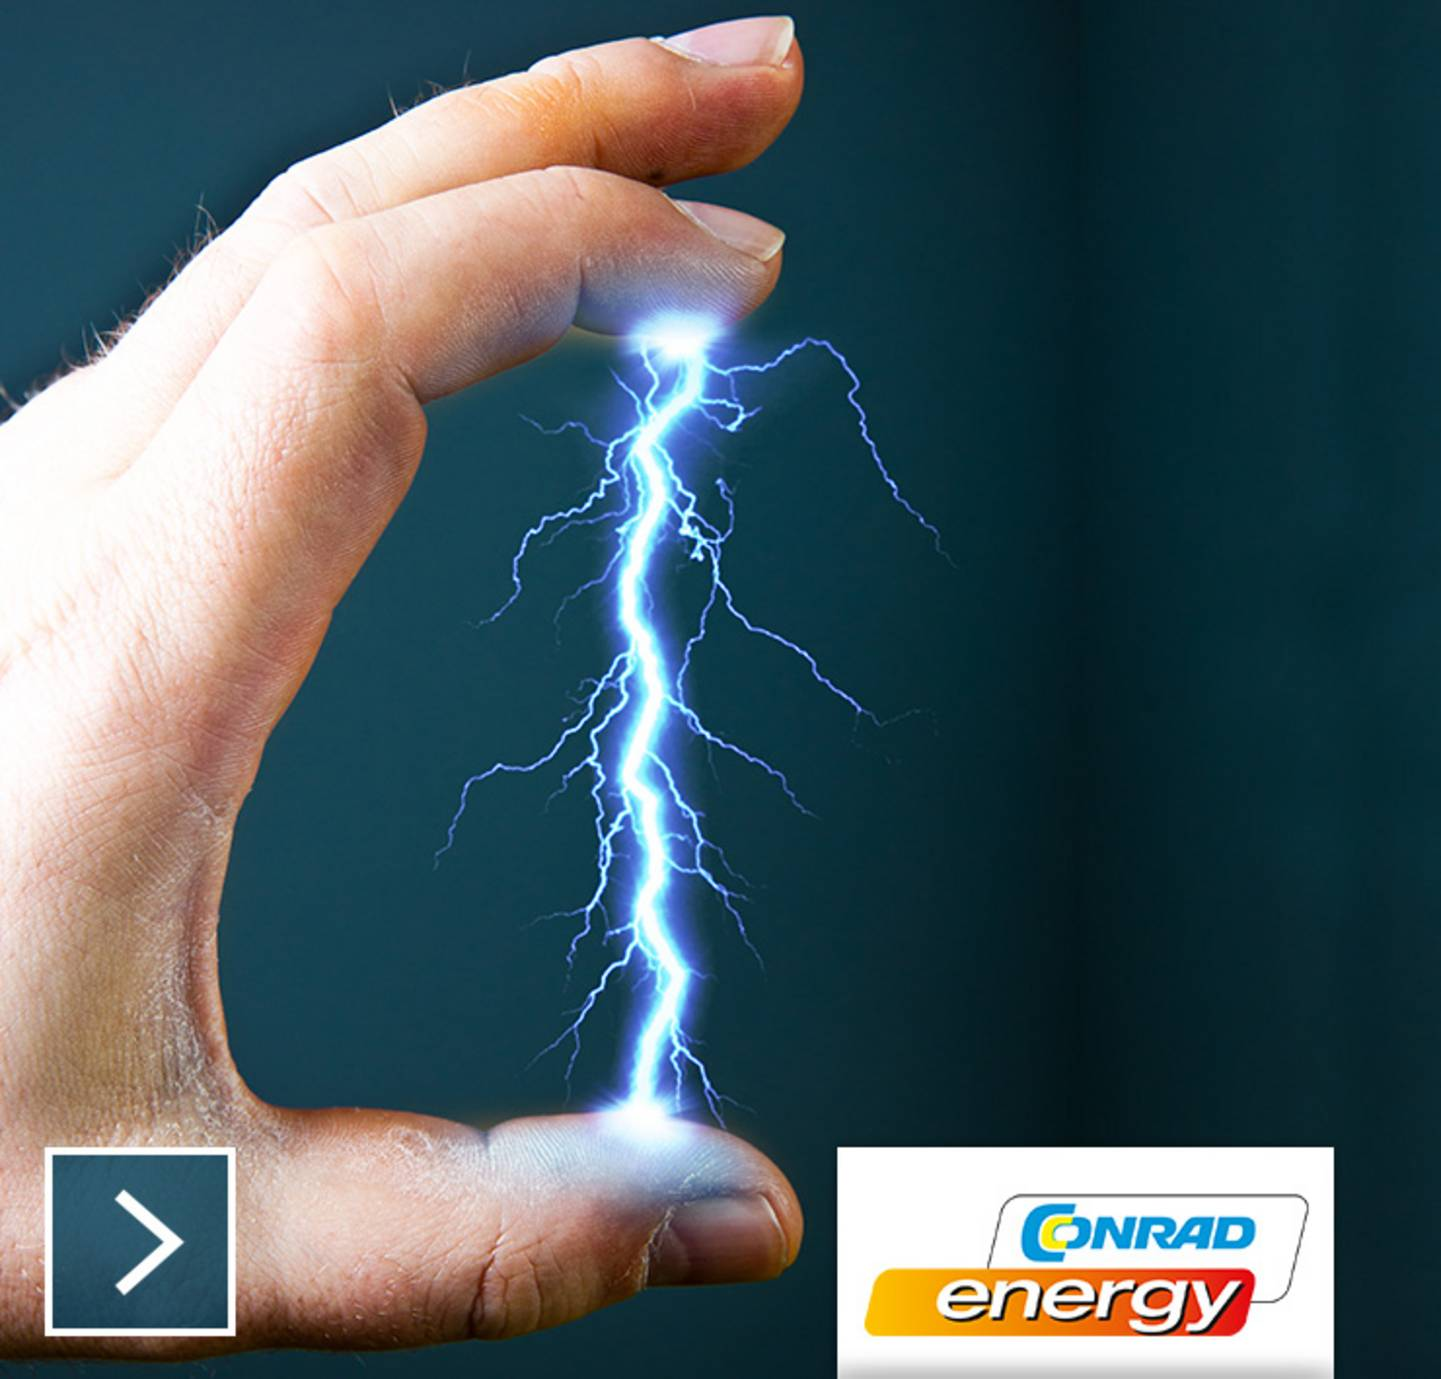 Conrad Energy »